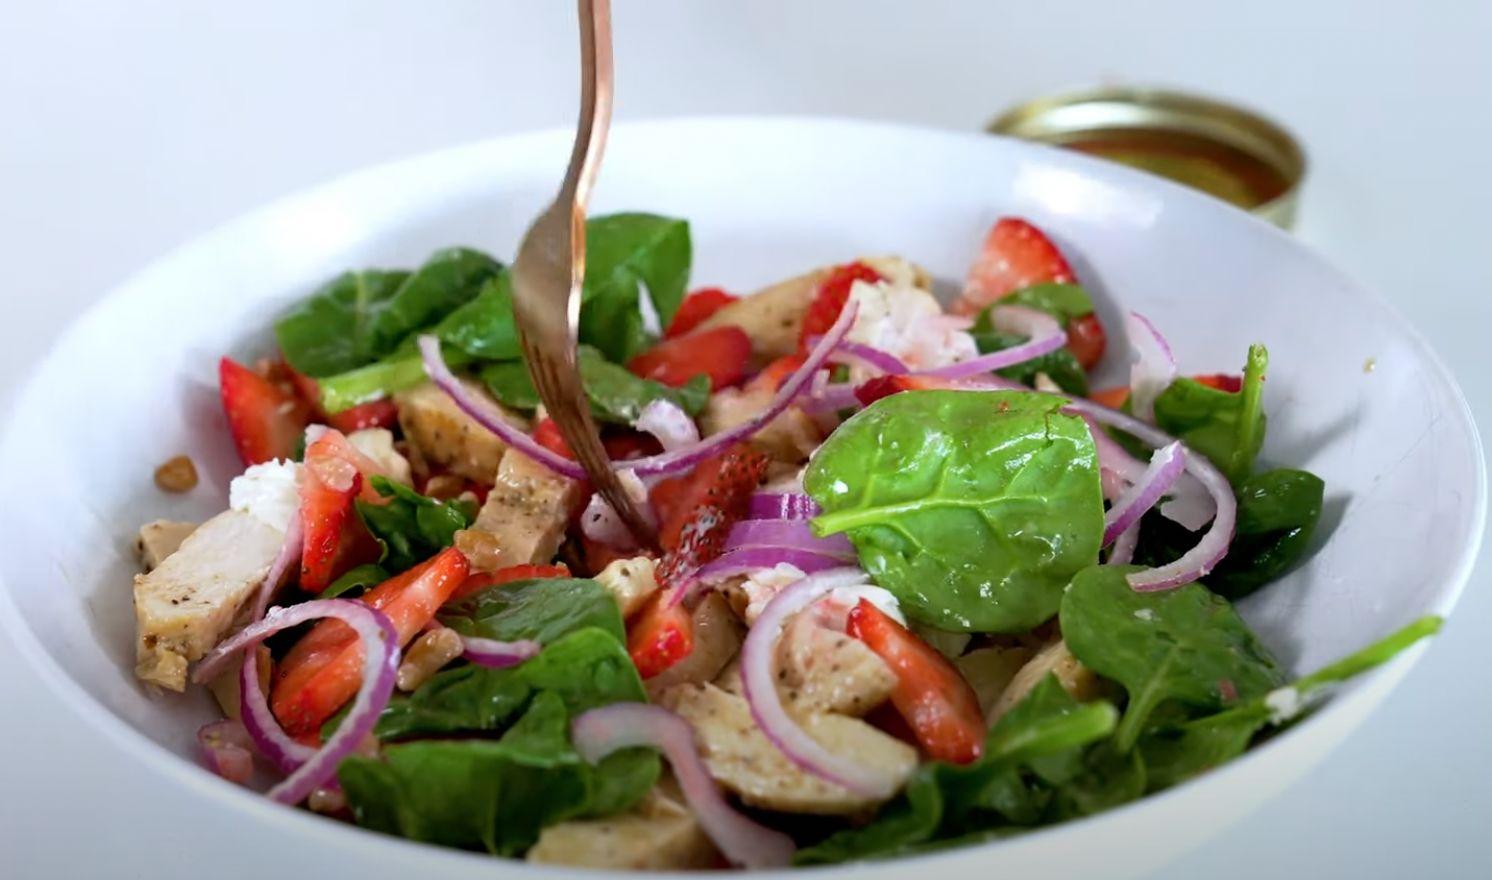 Strawberry Chicken Salad with Strawberry Balsamic Dressing Recipe